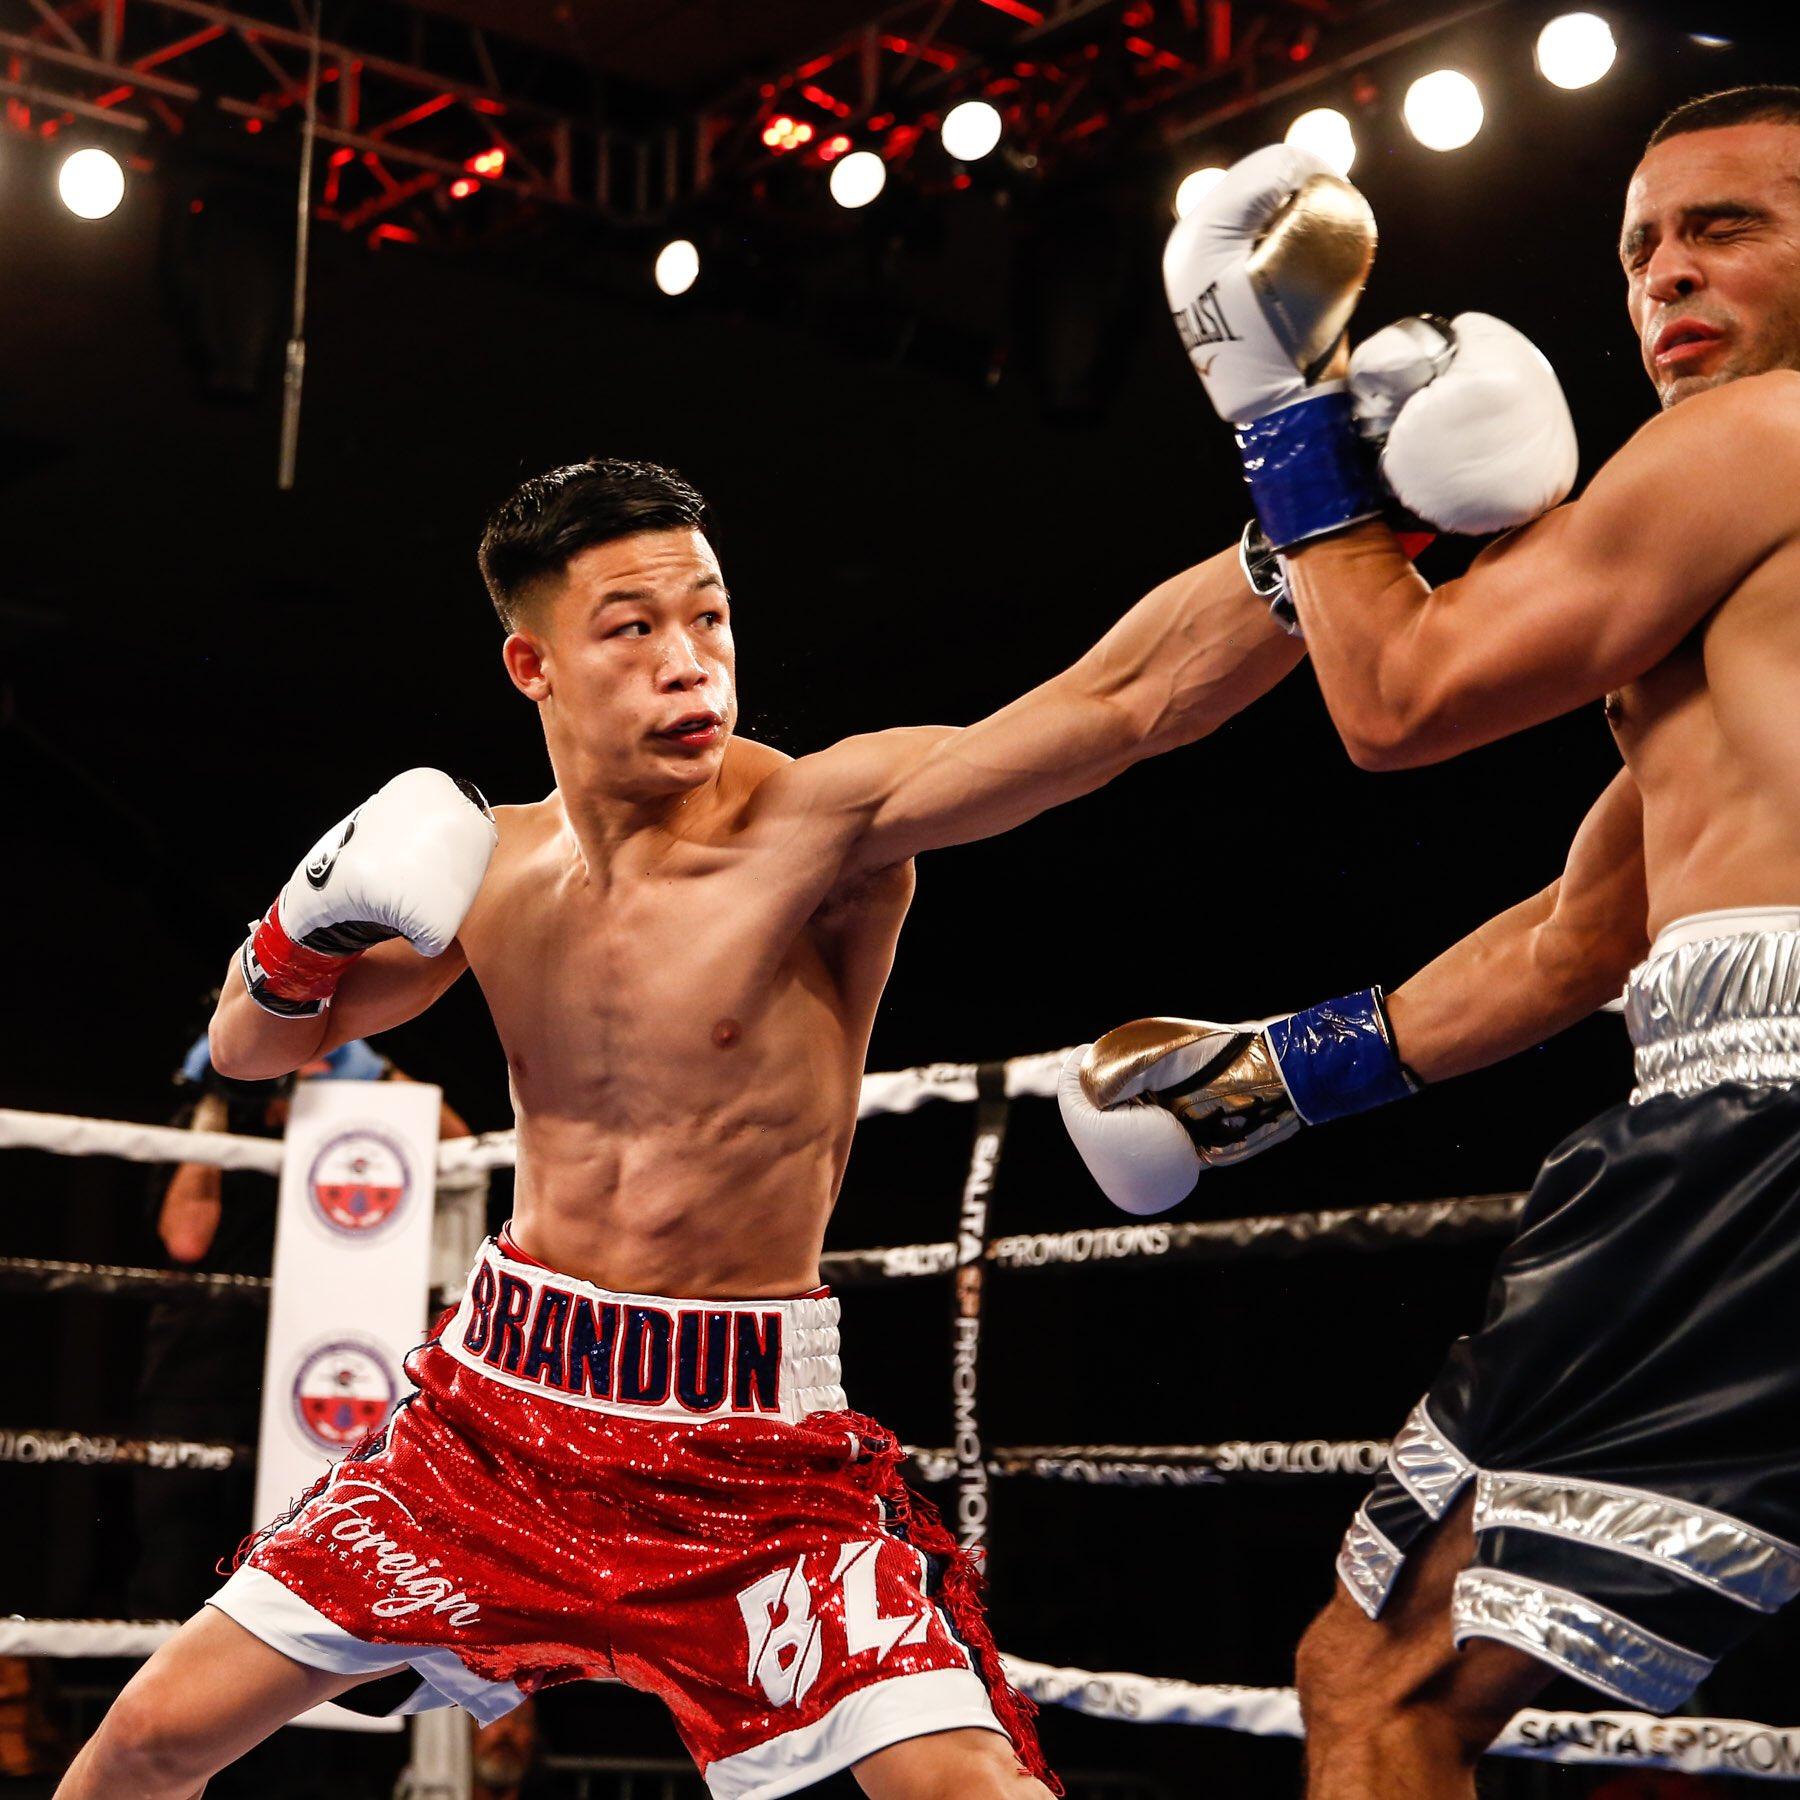 Brandun Lee (left) vs. Camilo Prieto. Photo courtesy of @ShowtimeBoxing on Twitter